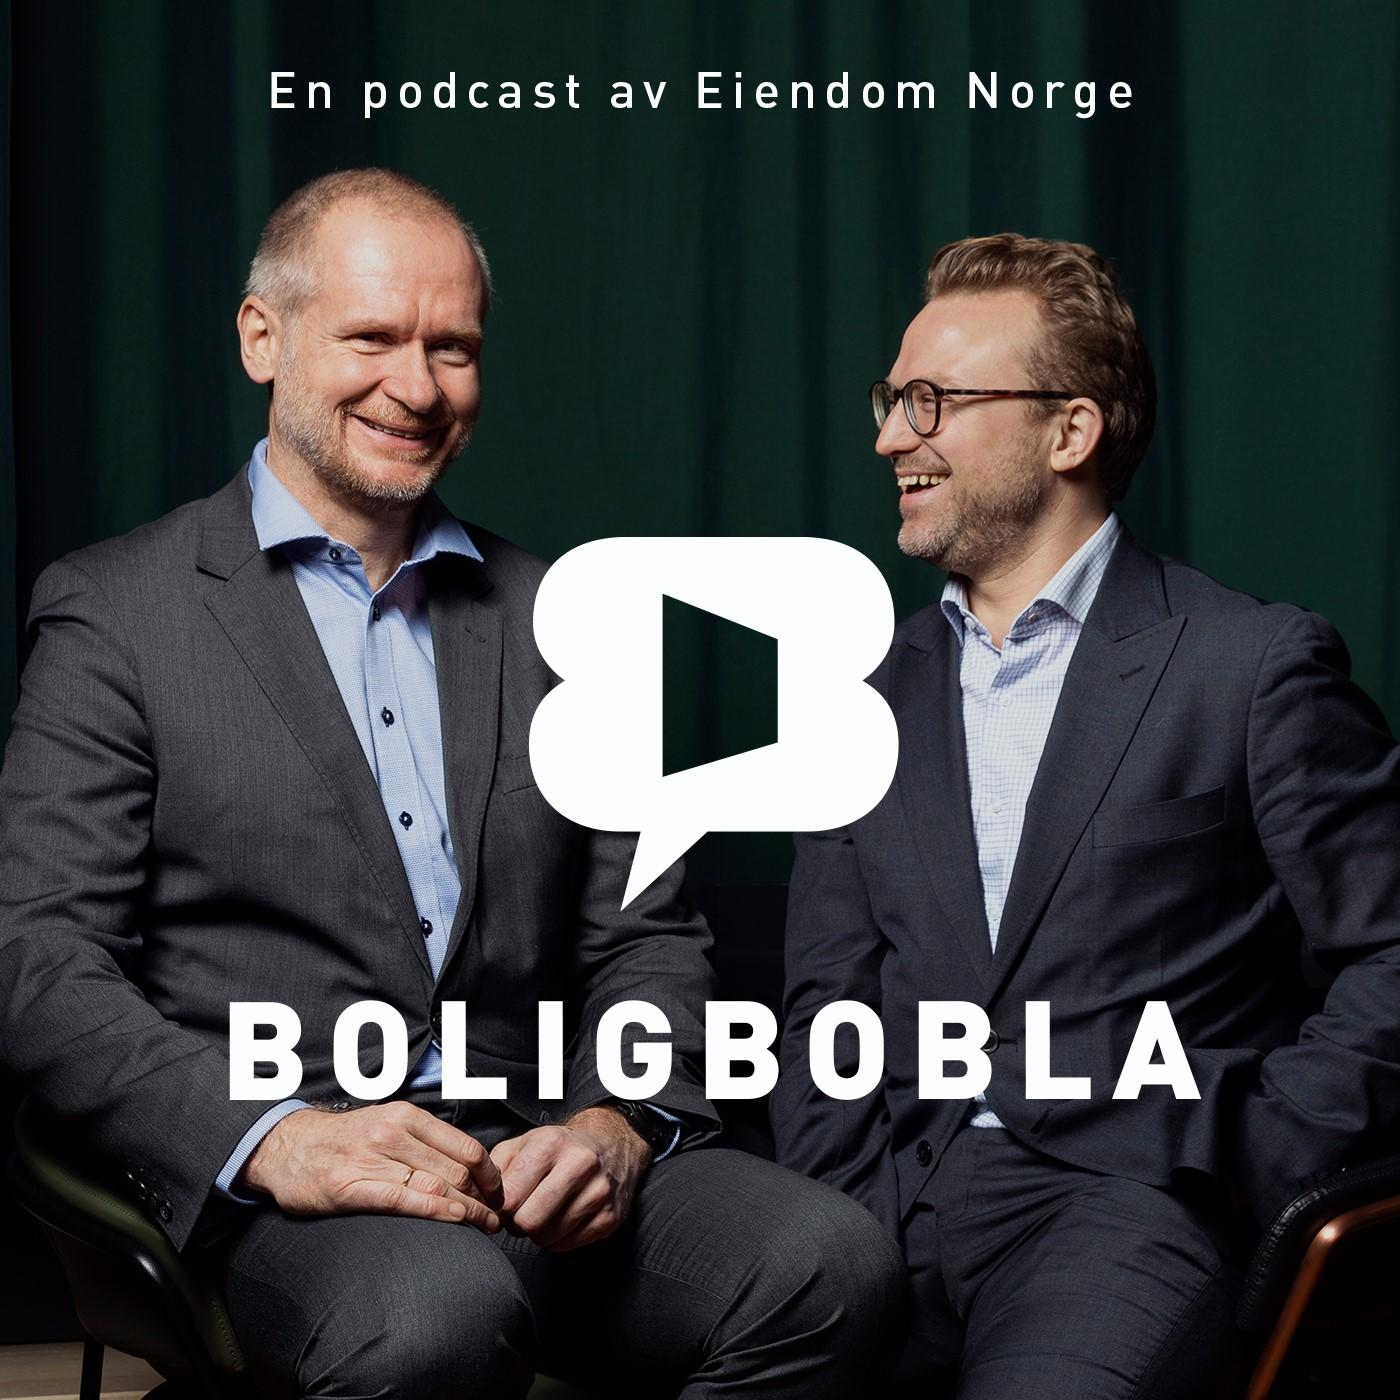 Podcasten Boligbobla fra EIendom Norge